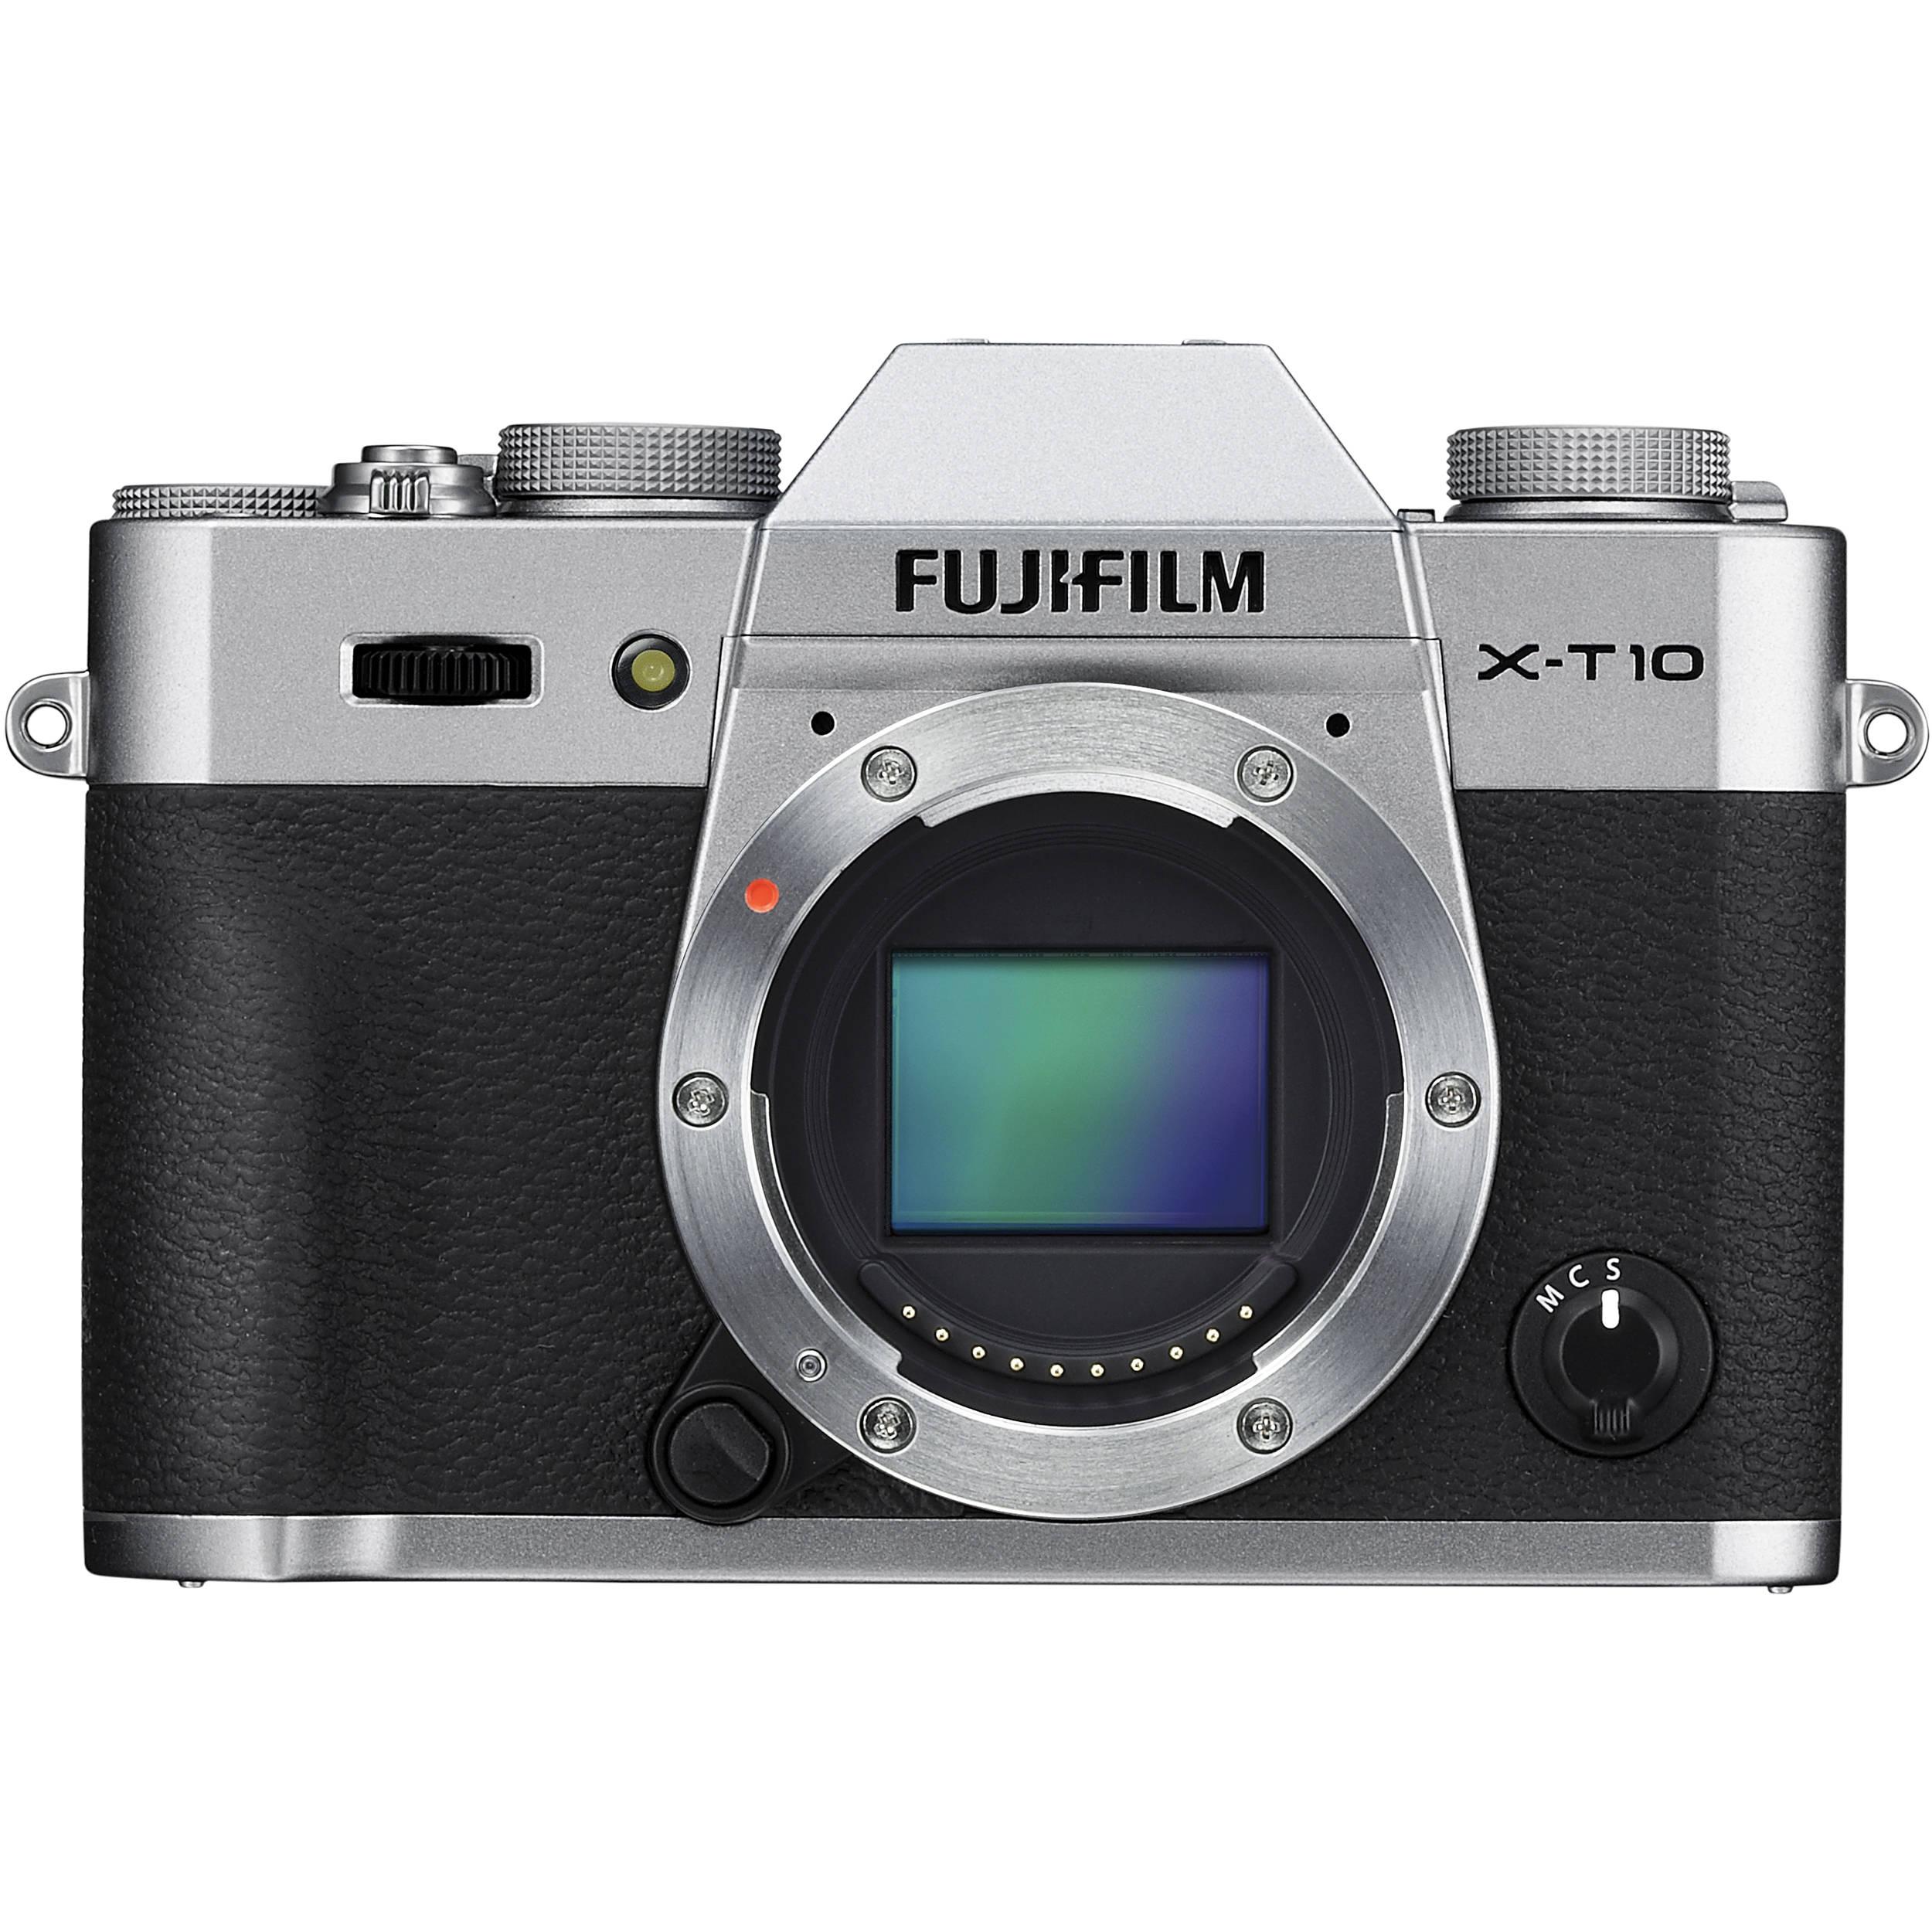 Fuji X T10 Bh Photo Video Screen Guard Fujifilm Xt10 Mirrorless Digital Camera Silver Body Only